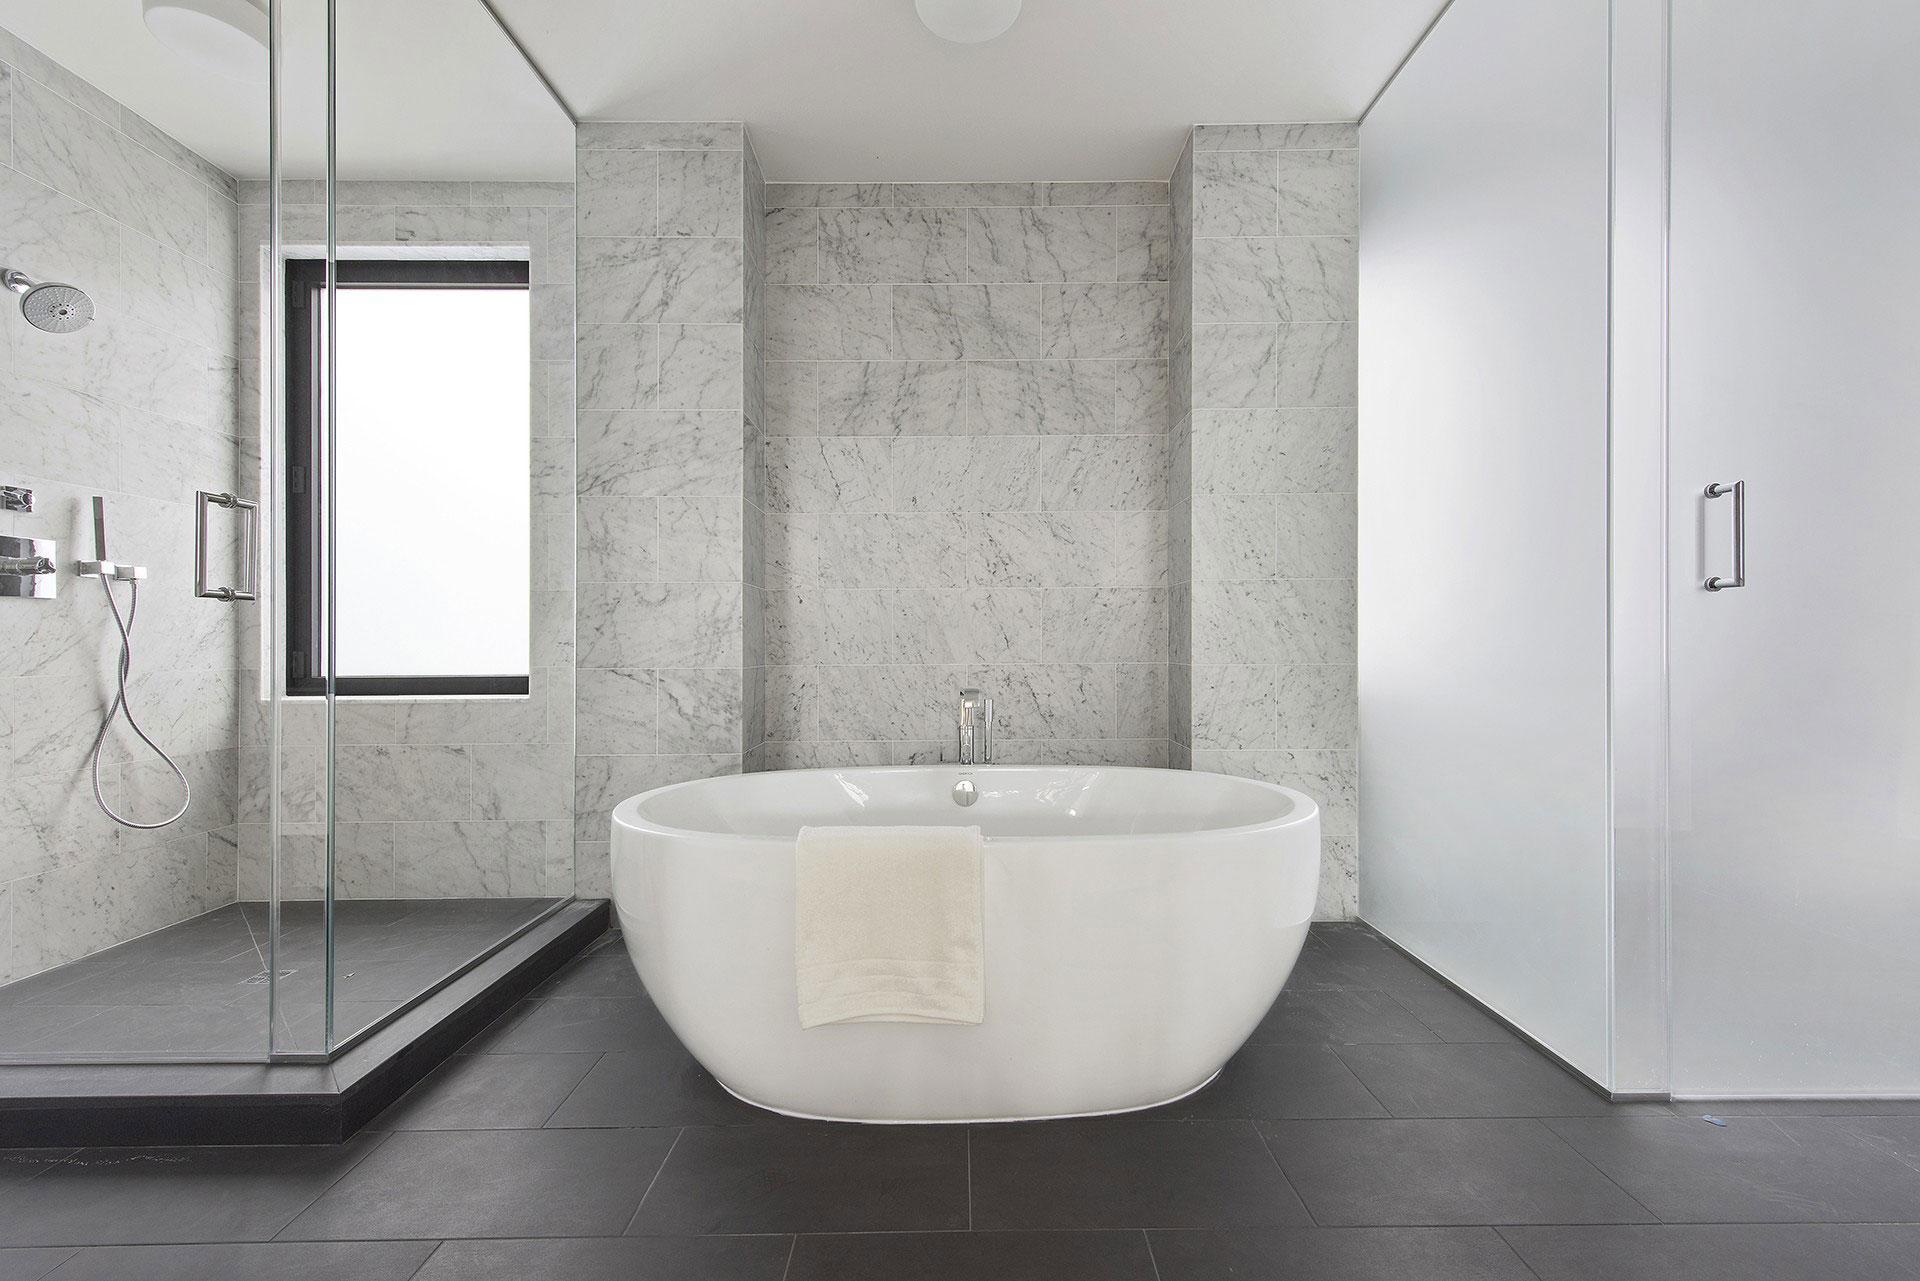 Marble bathroom with a tub